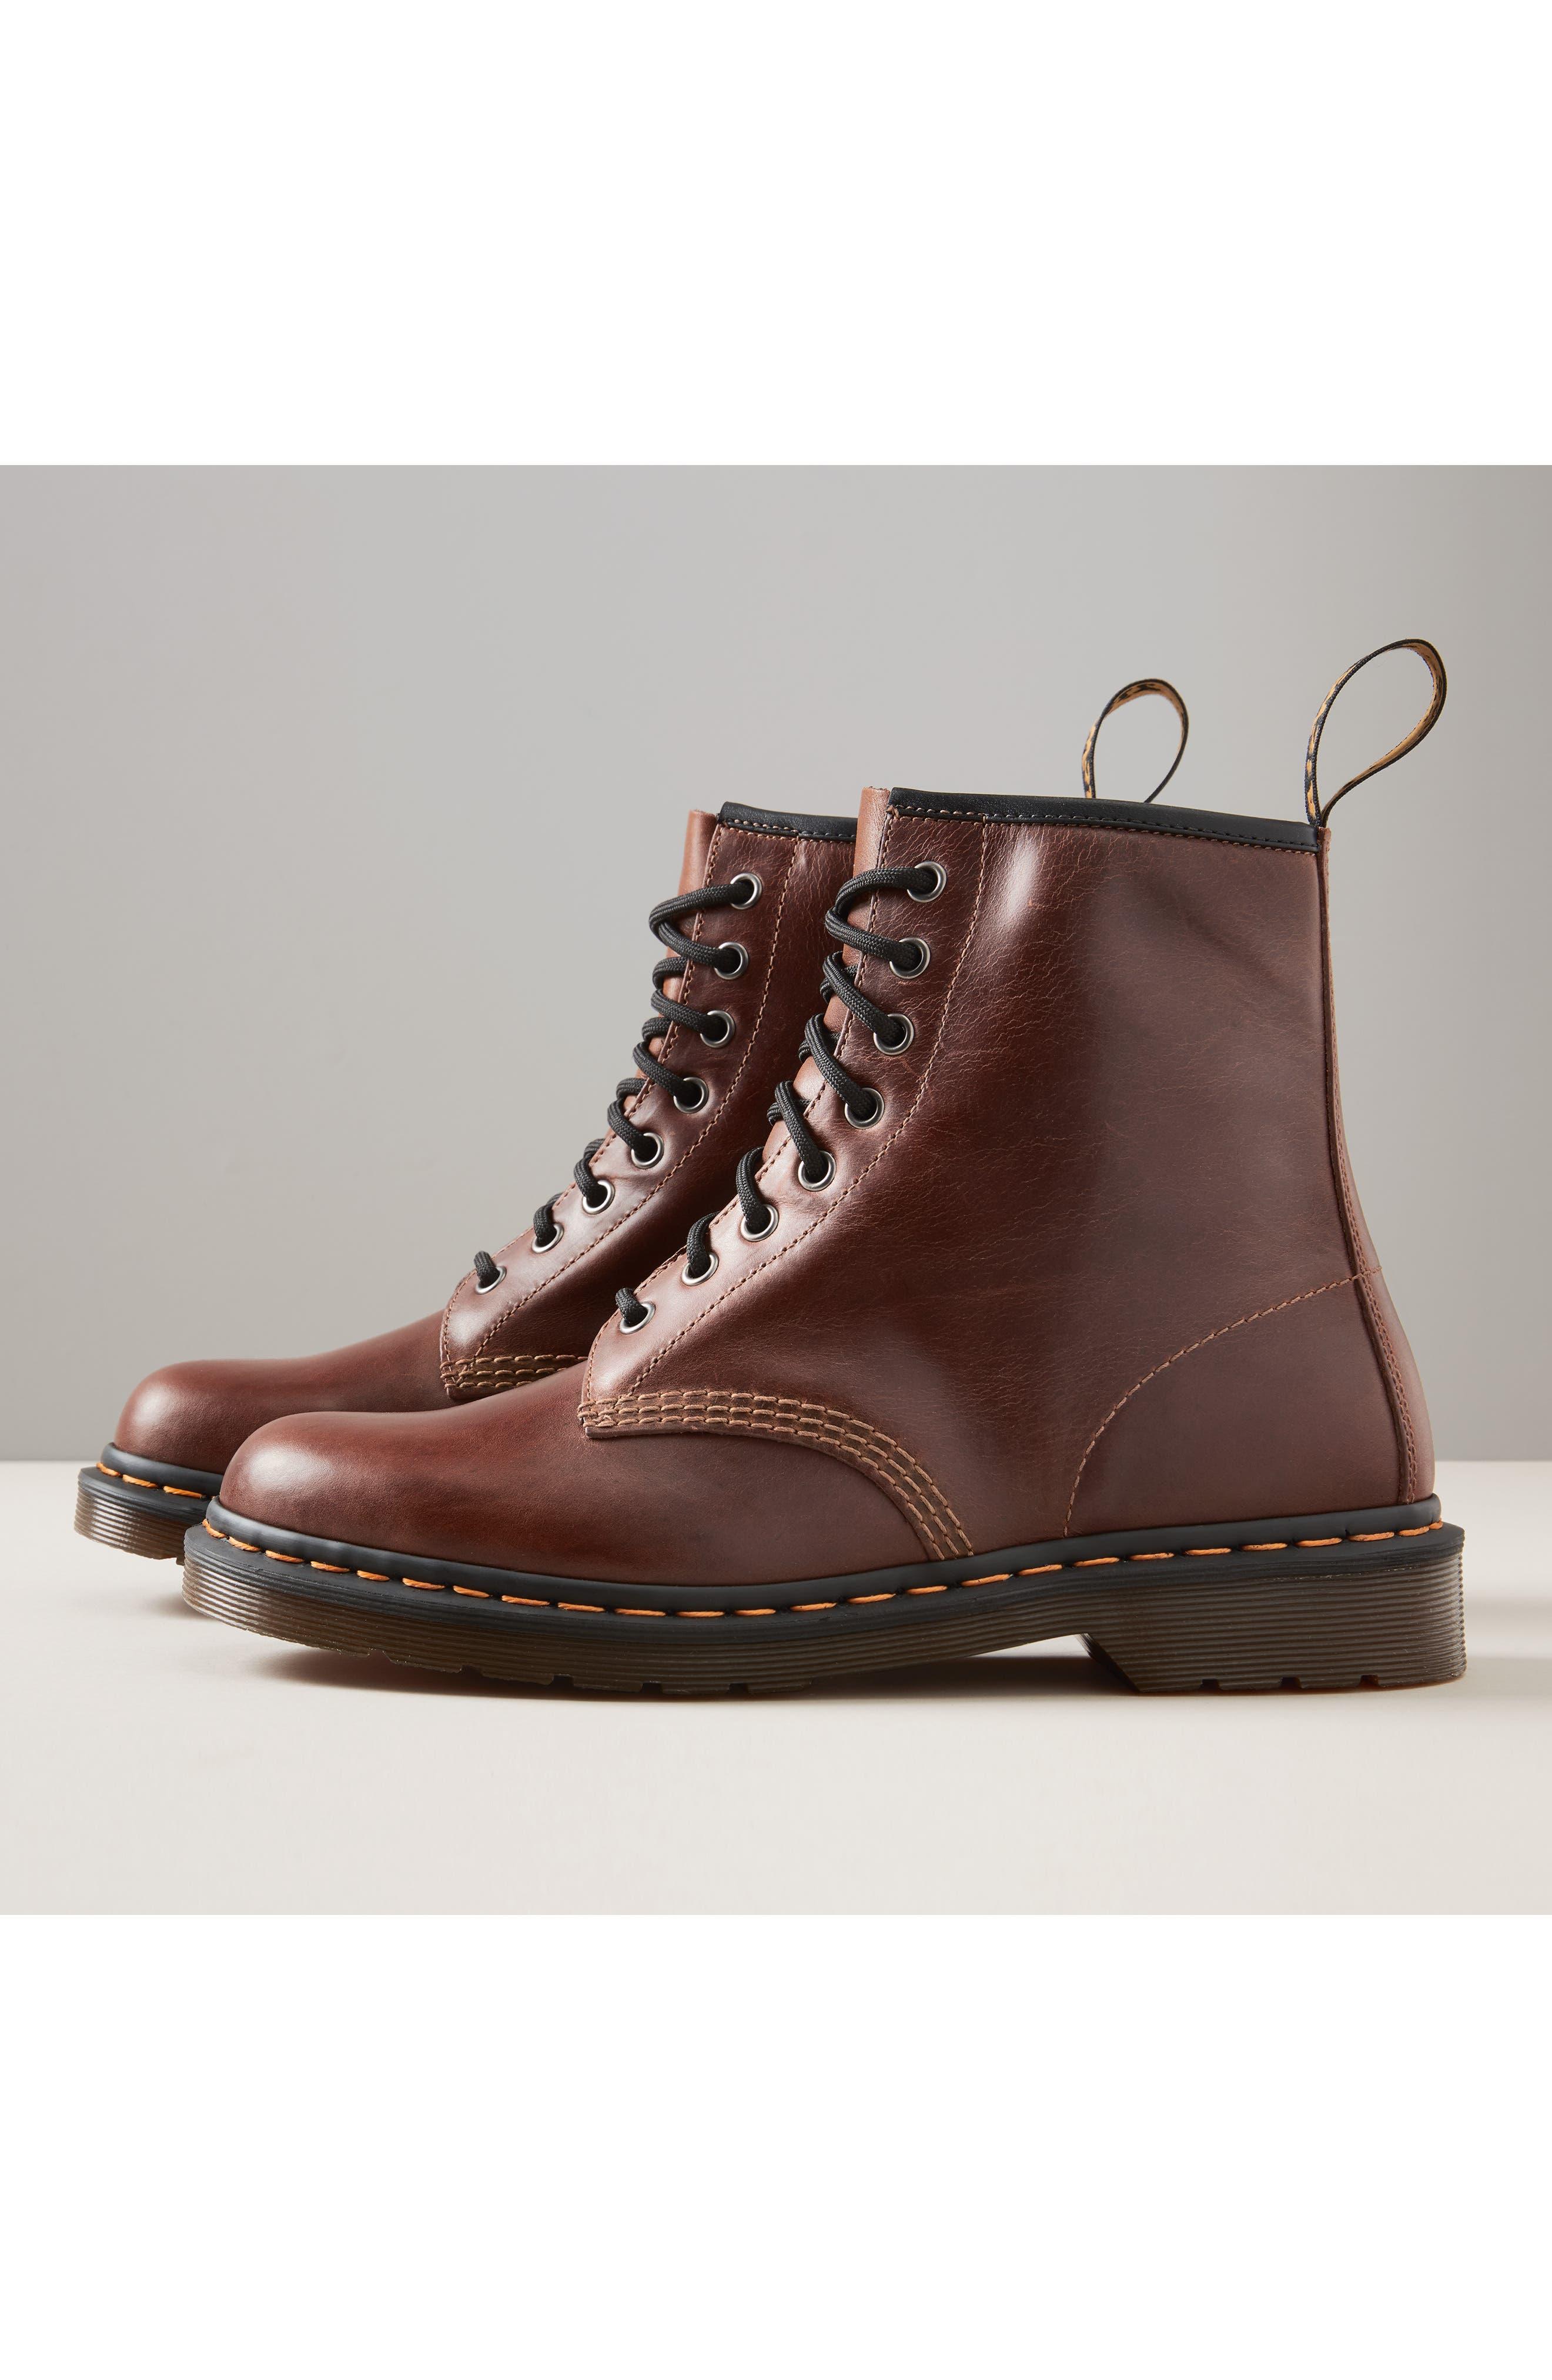 1460 8-Eye Boot,                             Main thumbnail 1, color,                             243